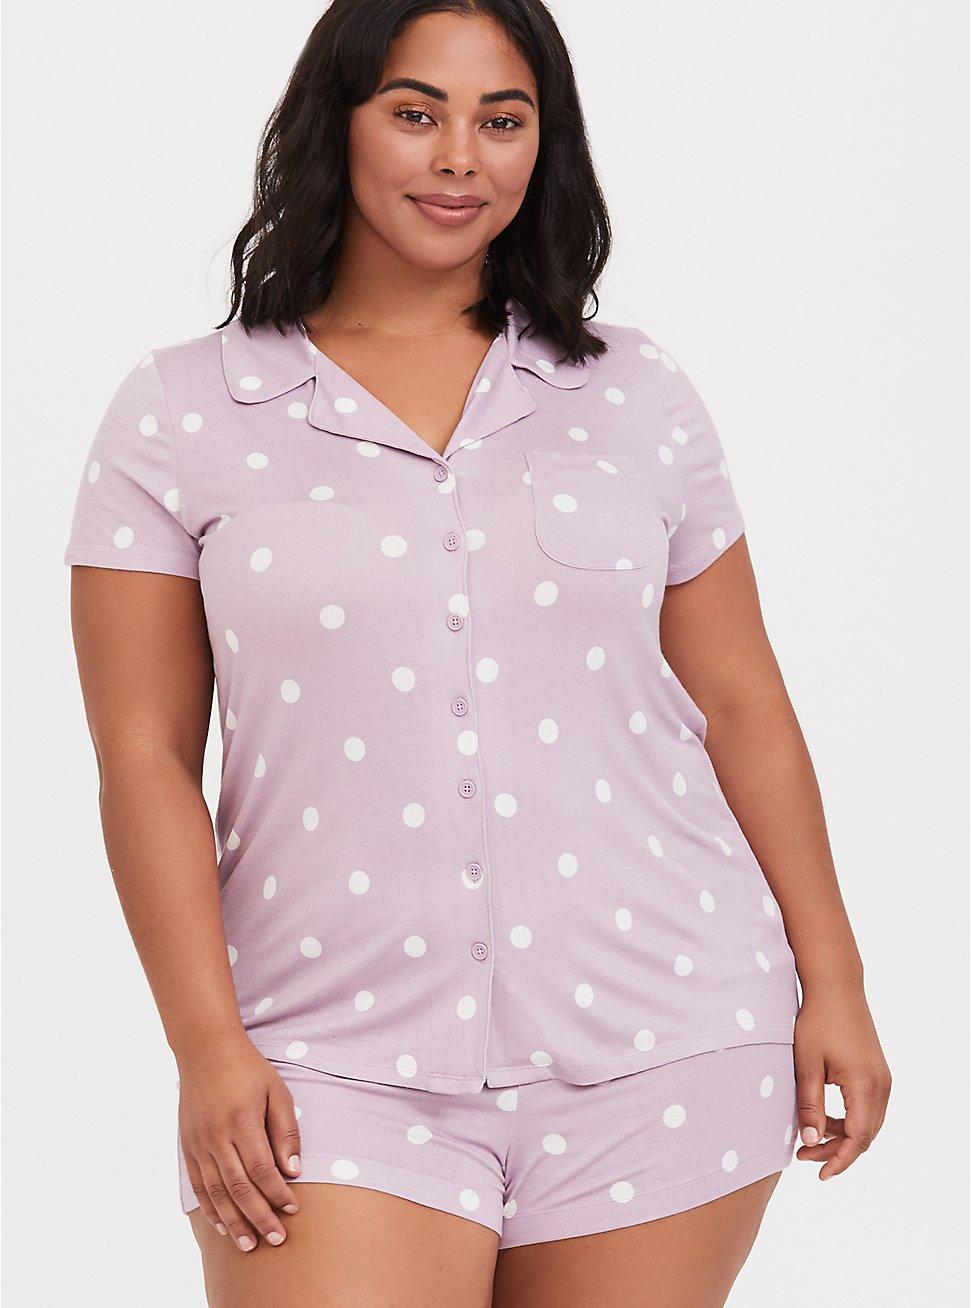 Light Lavender Purple Polka Dot Sleep Shirt, MULTI, hi-res